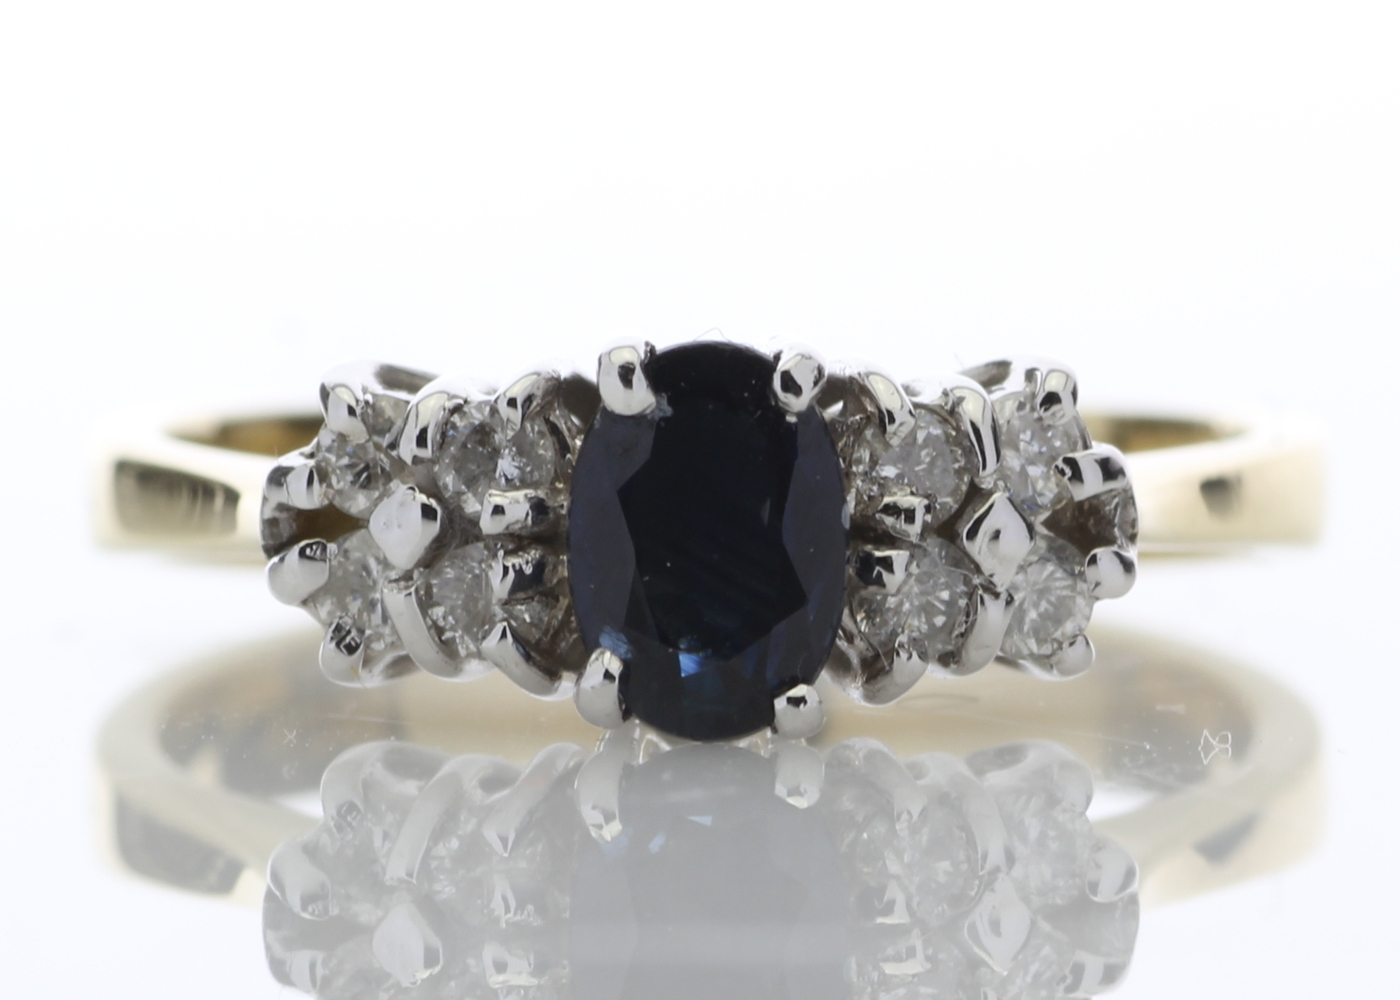 Lot 11 - 18ct Boat Shape Cluster Diamond Saphire Ring 0.50 Carats